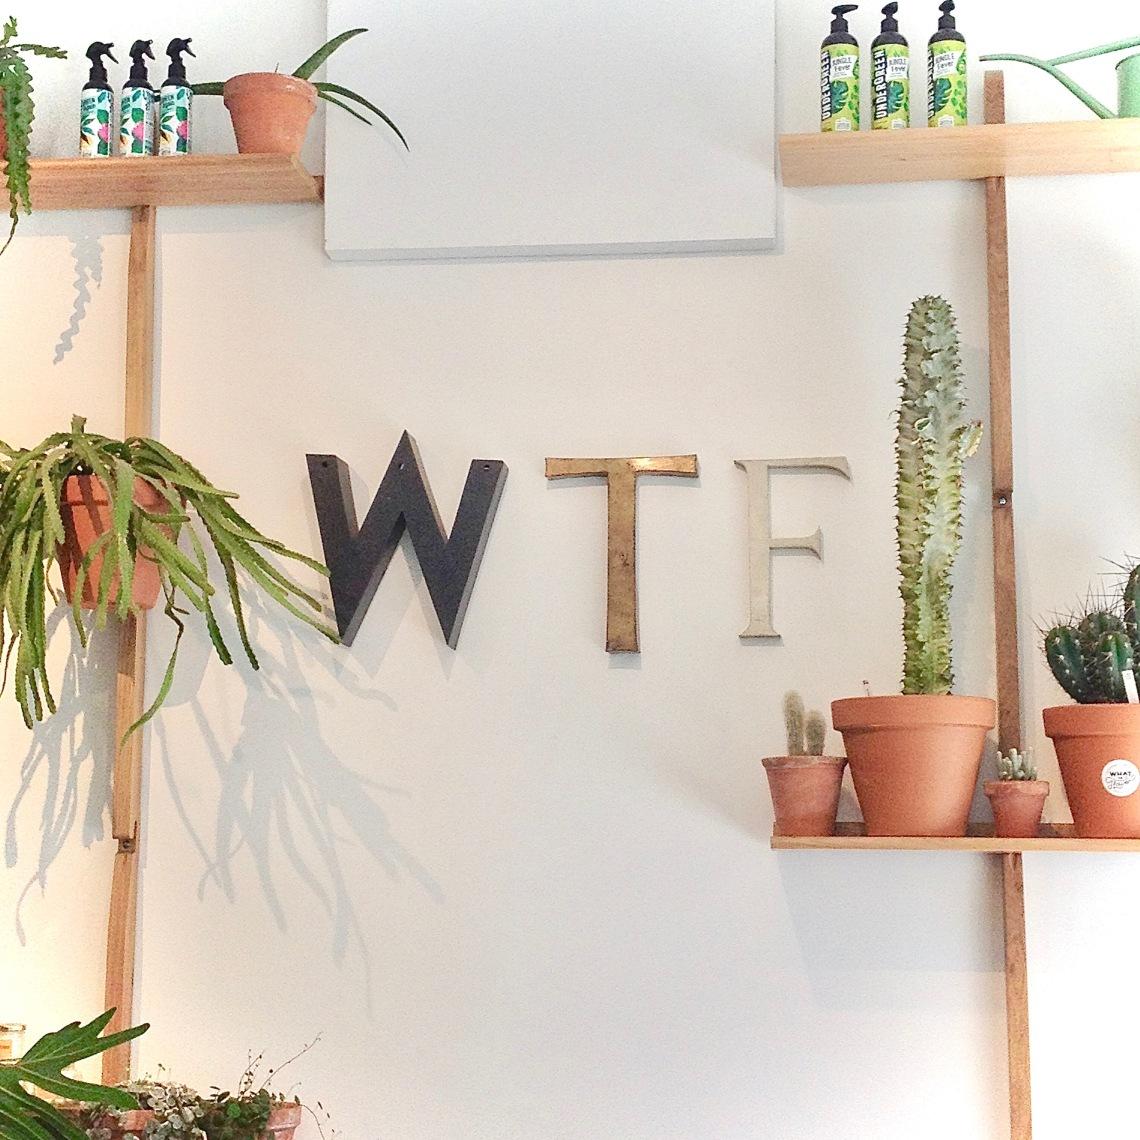 WTF 3